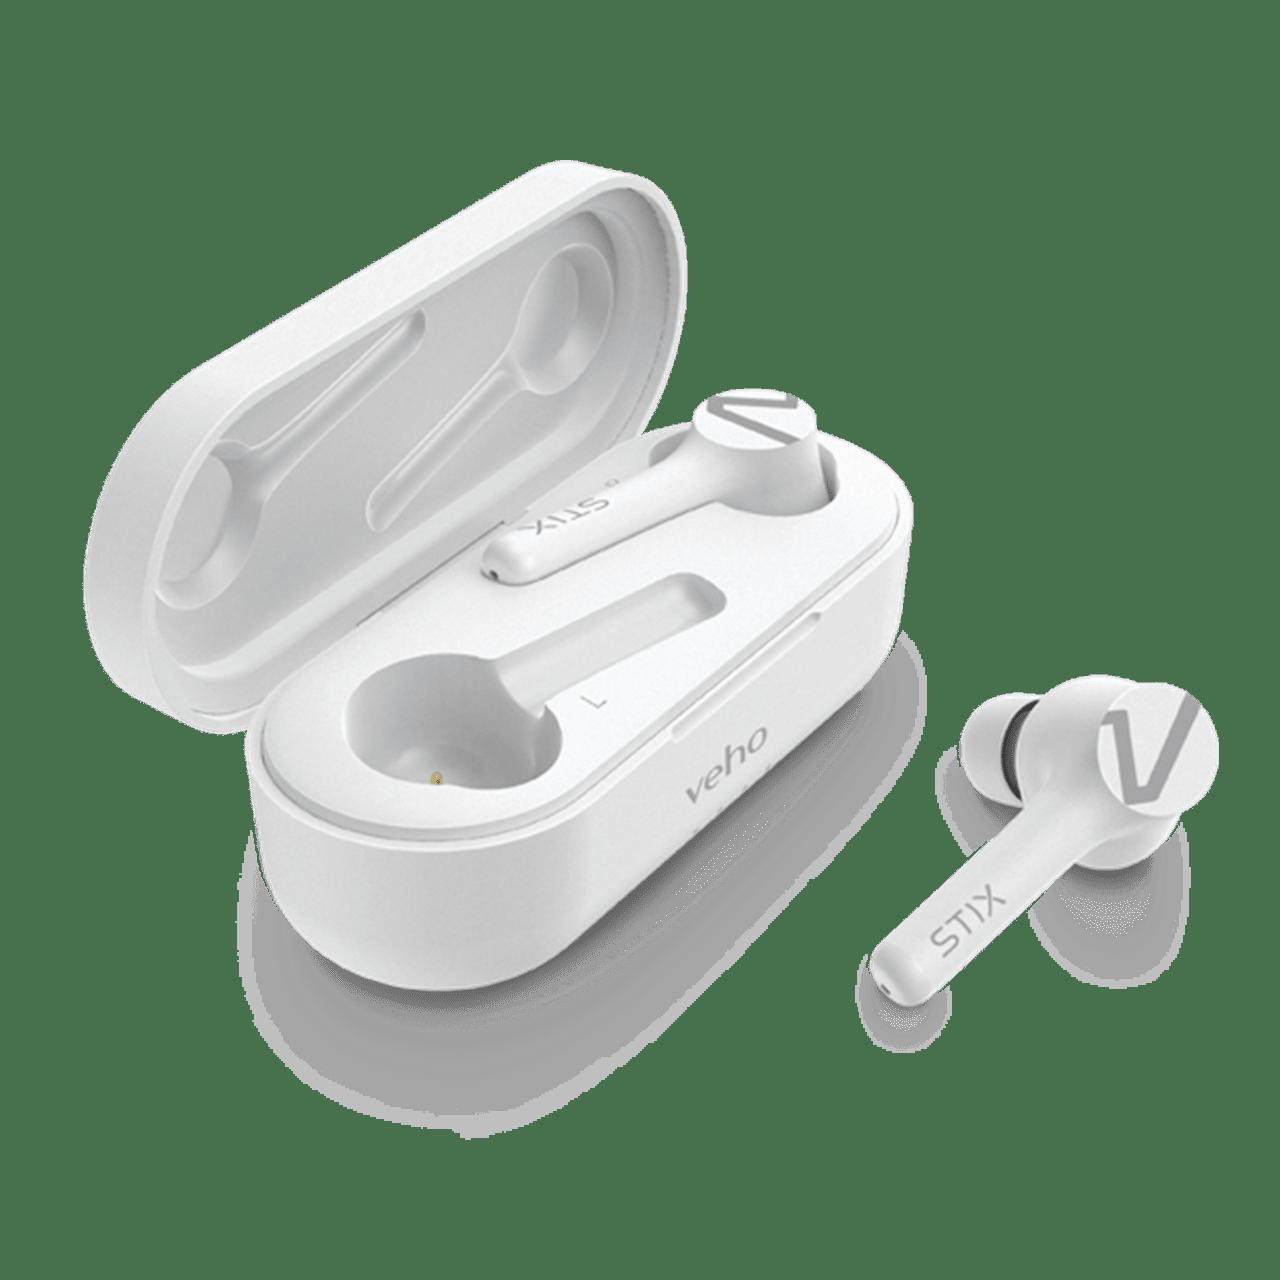 Veho STIX Ice White True Wireless Bluetooth Earphones - 2